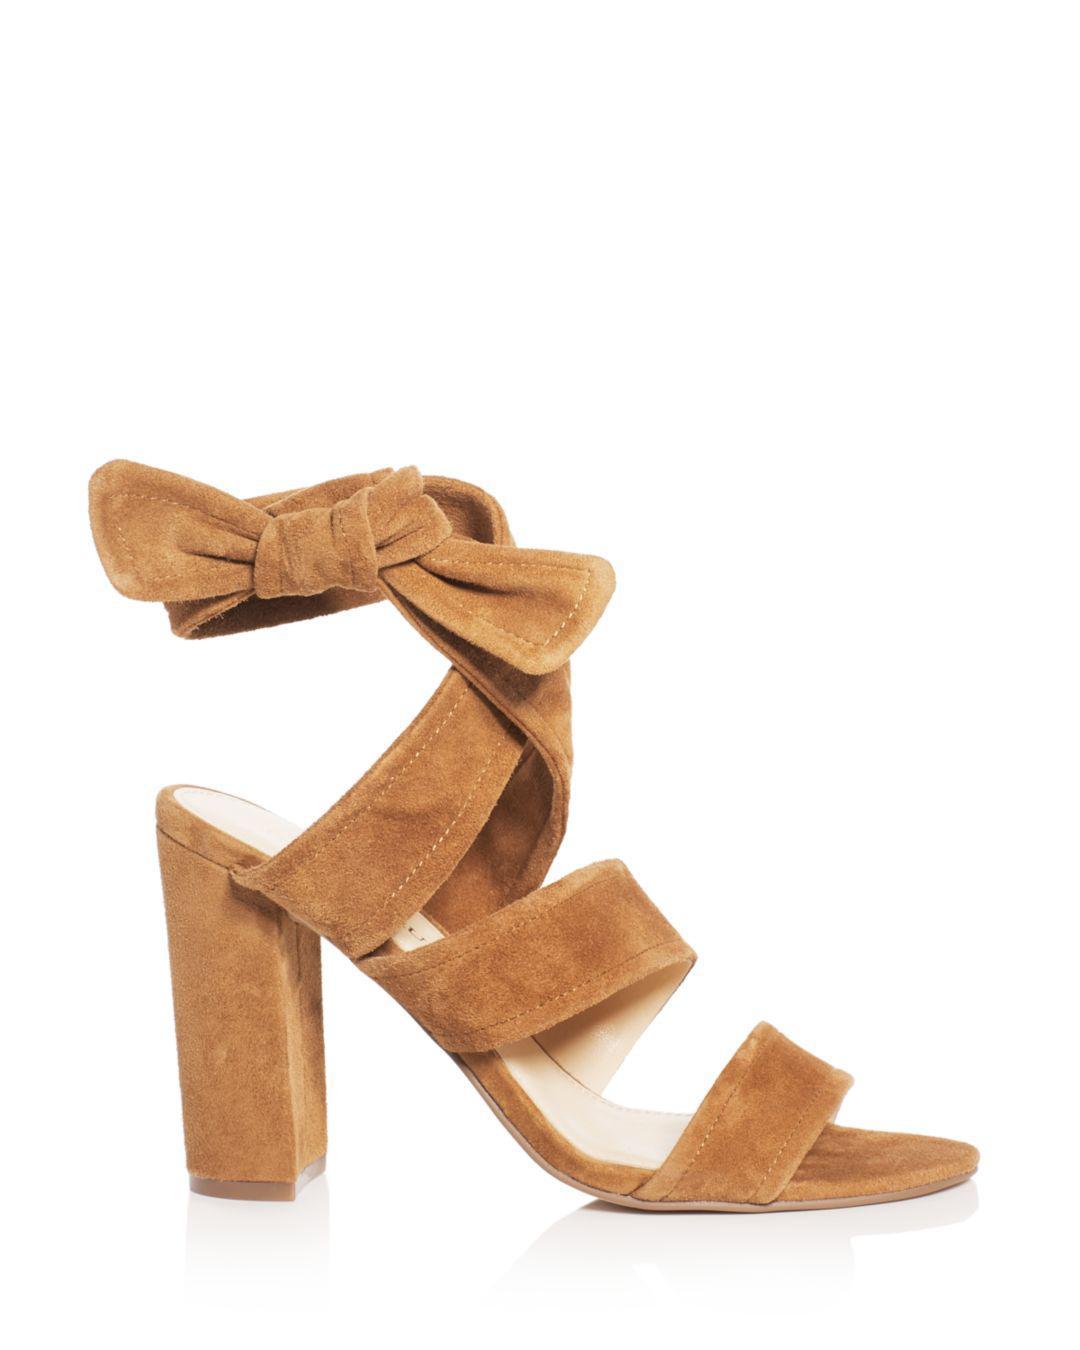 3c68a2bb6f80 Ivanka Trump Kiffie Ankle Tie High-heel Sandals in Brown - Lyst